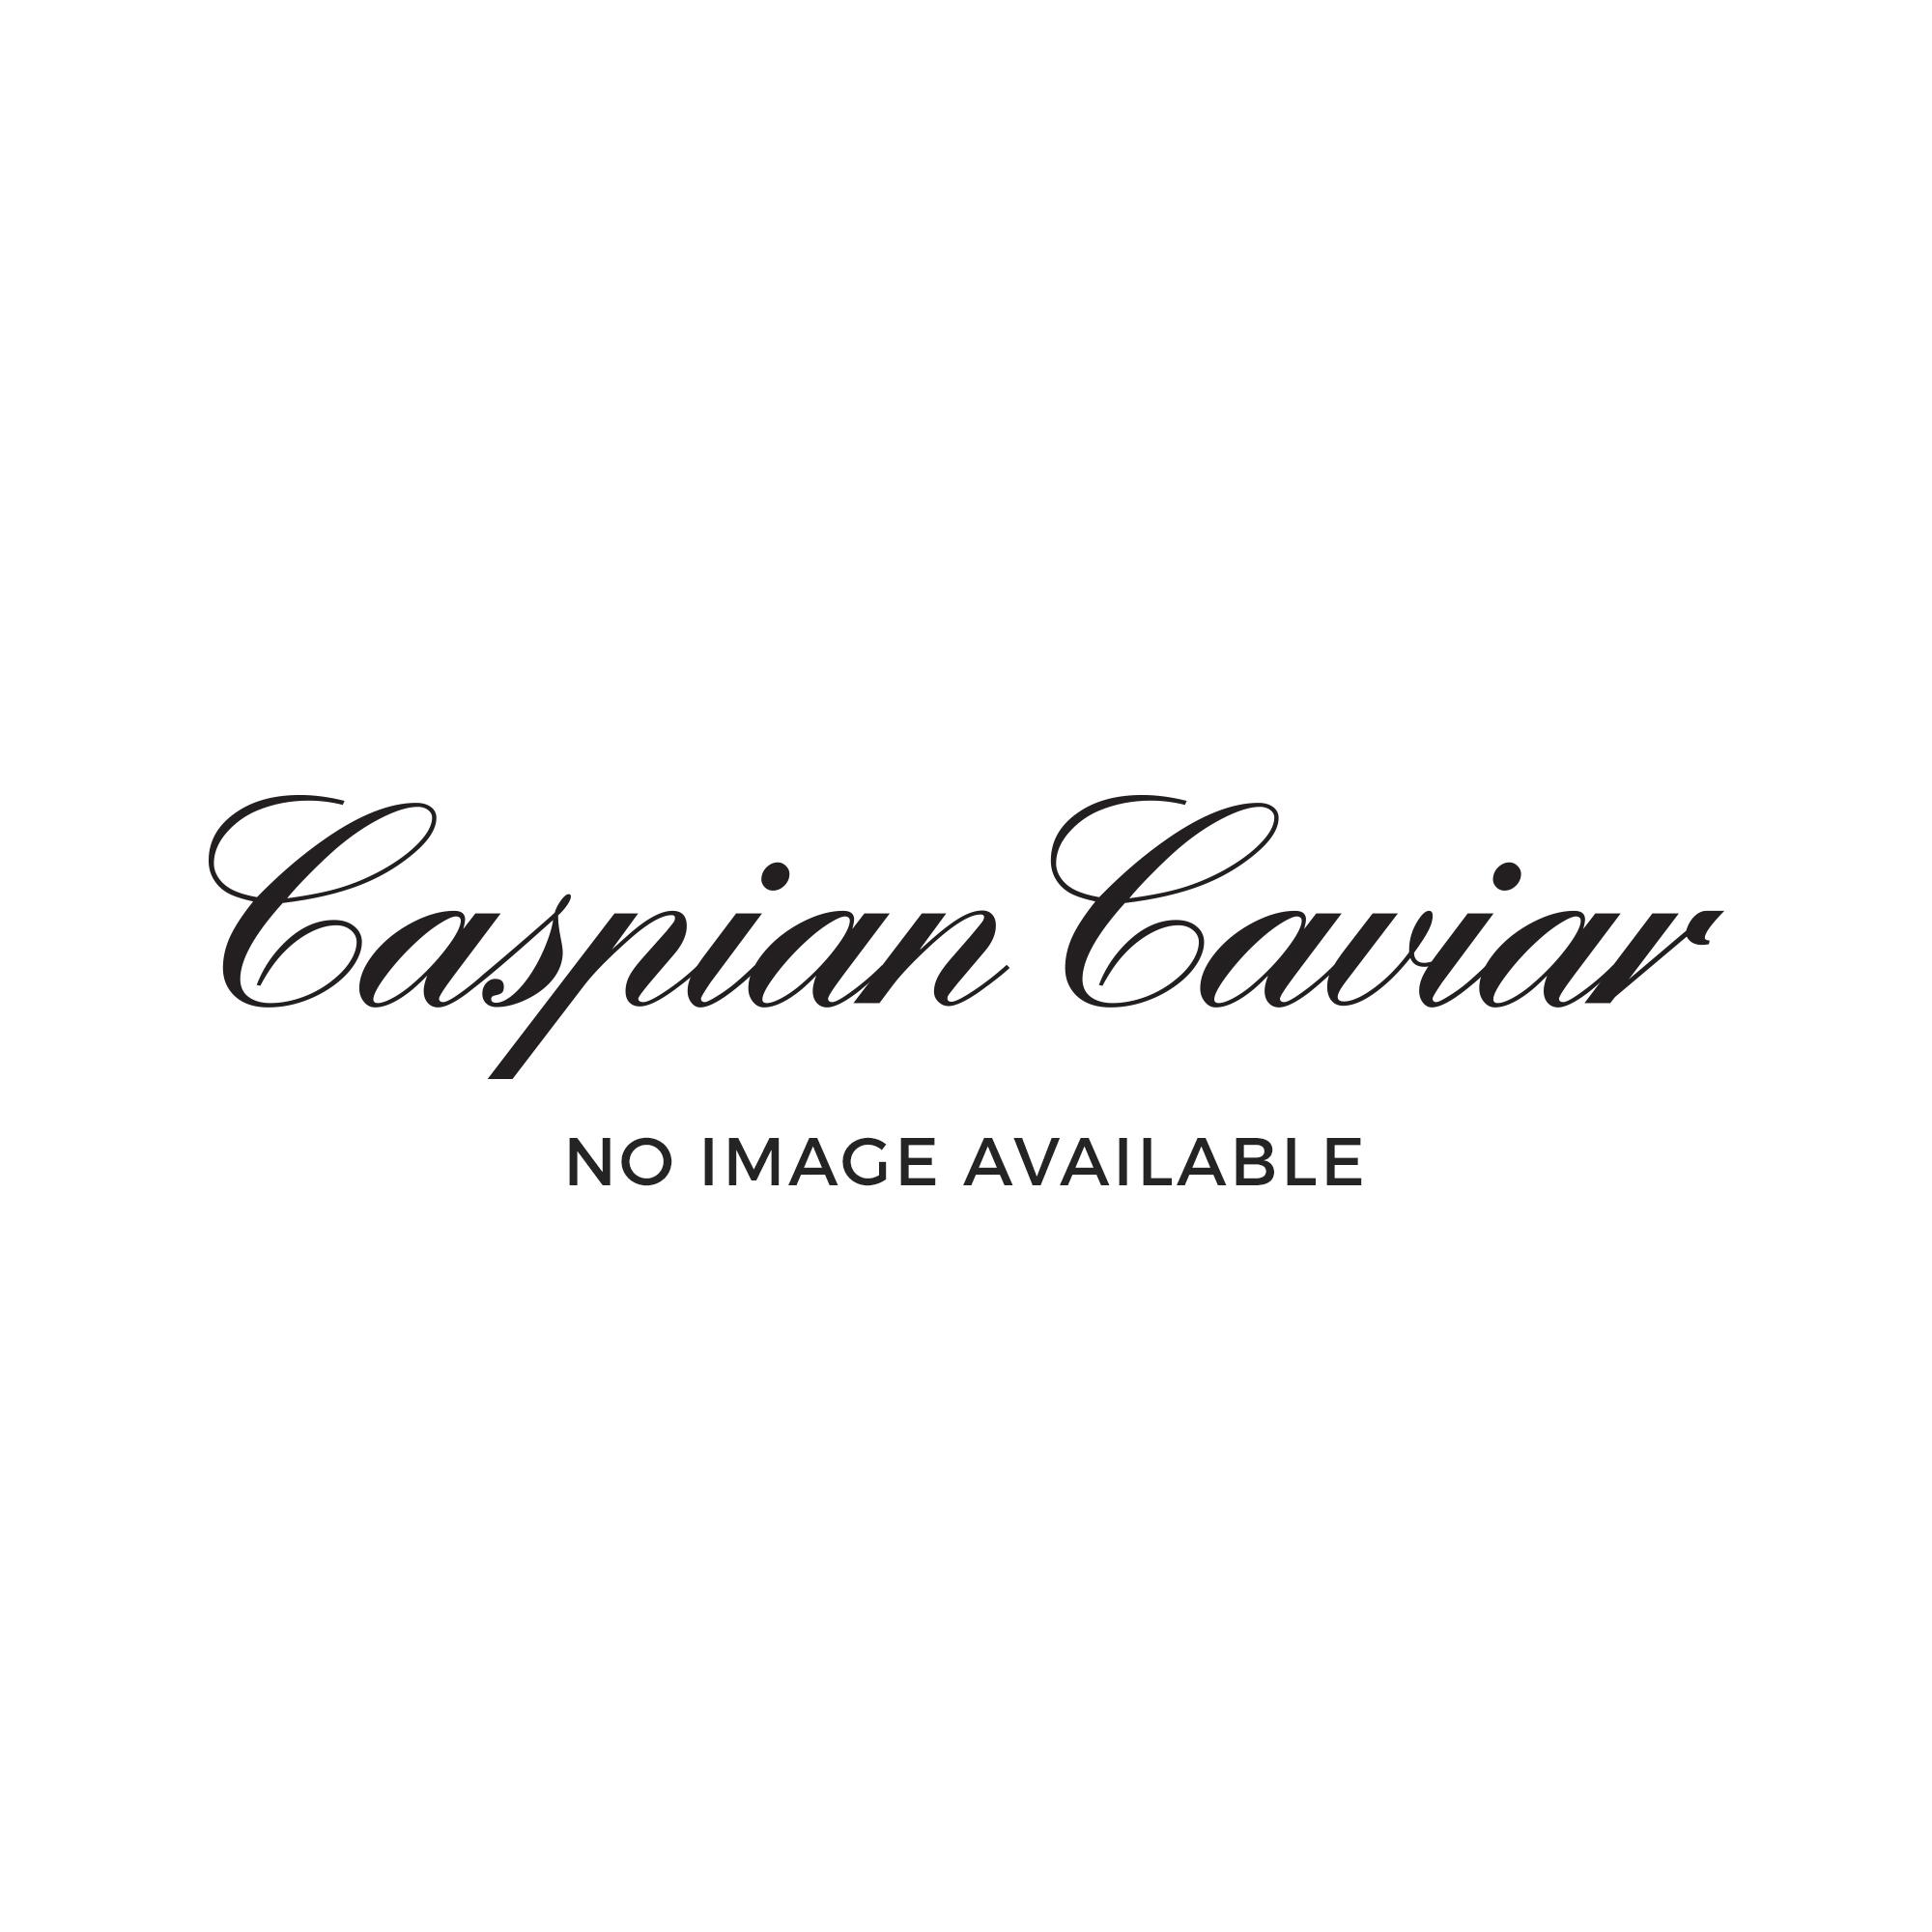 Caspian Caviar Beluga Vodka & Caviar Gift Set